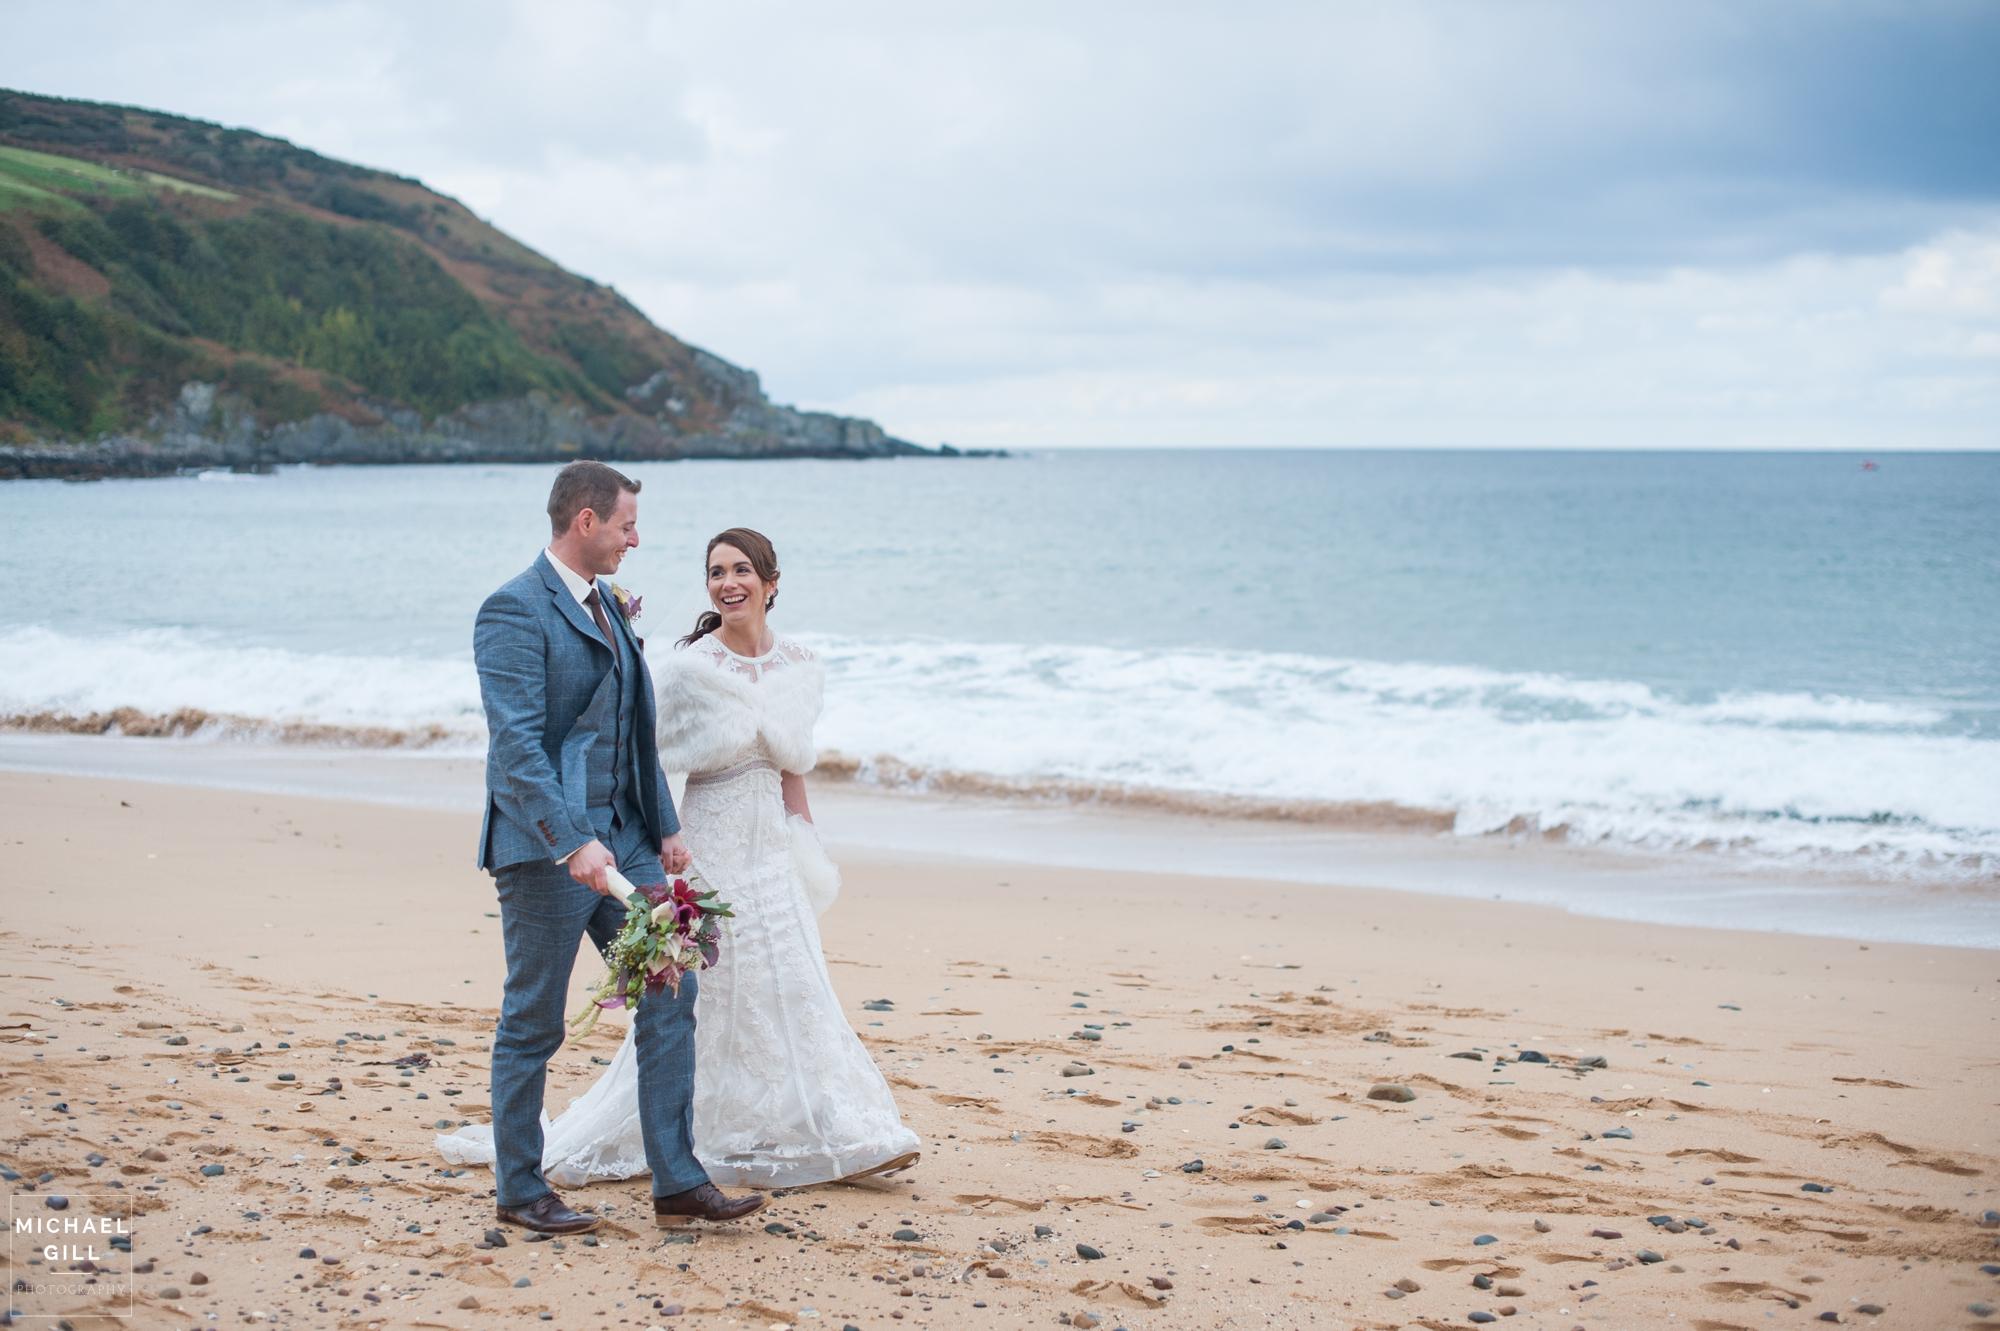 Michael_Gill_Photography_Kinnego_Redcastle_Hotel_Wedding5.jpg